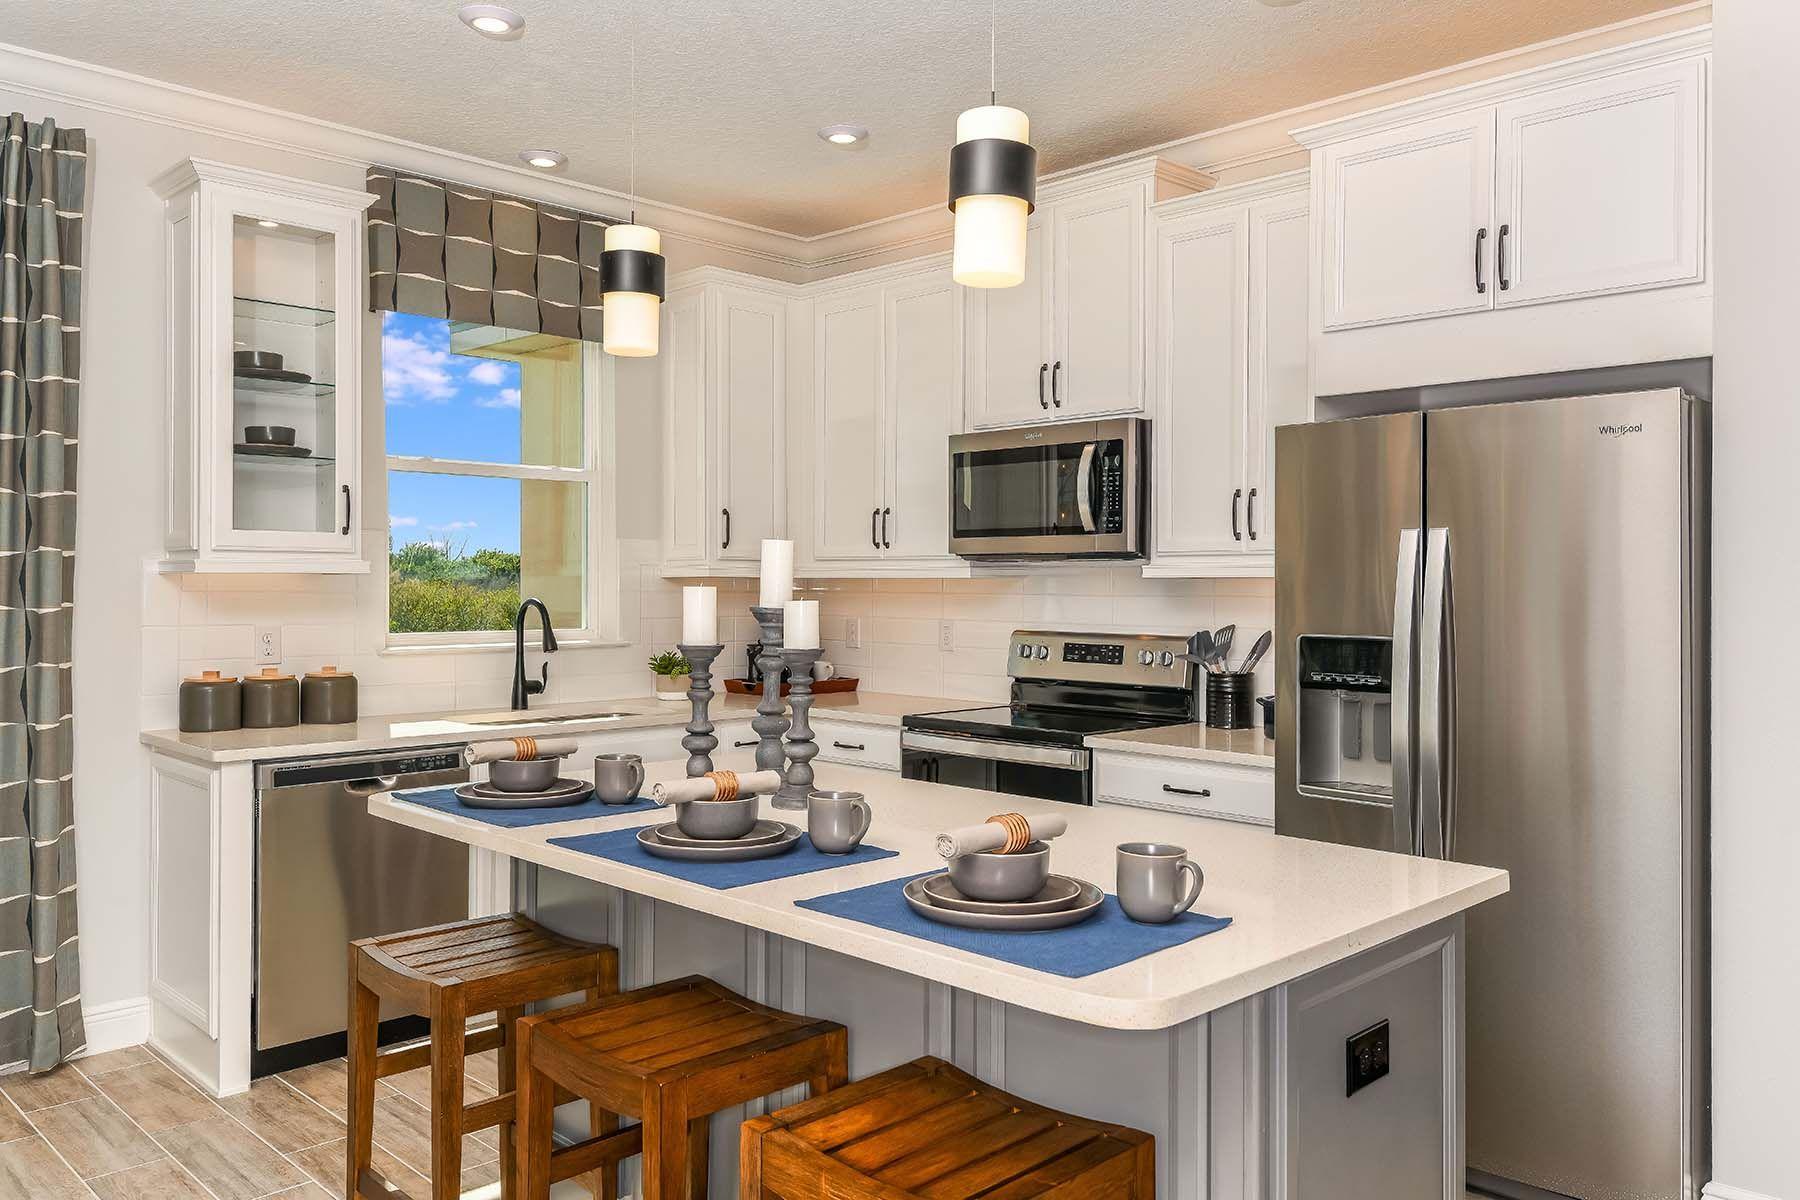 Kitchen featured in the Marina II By Mattamy Homes in Sarasota-Bradenton, FL